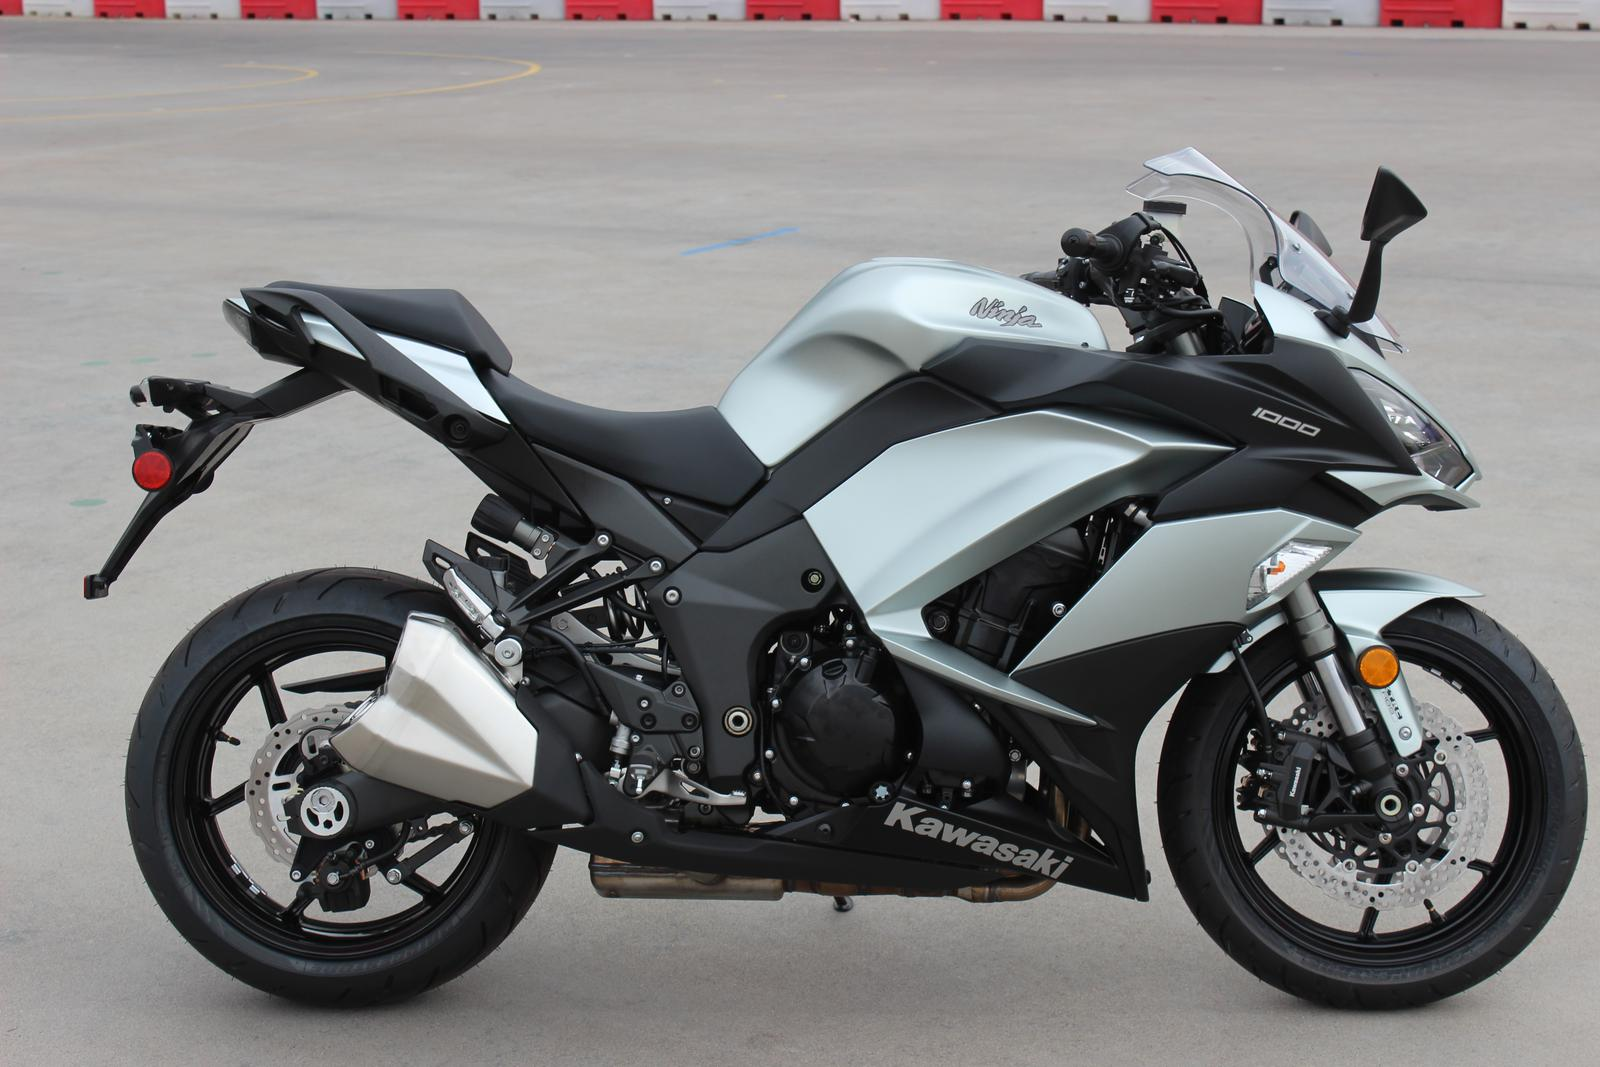 2018 Kawasaki Ninja 1000 Abs Go Az Motorcycles In Scottsdale